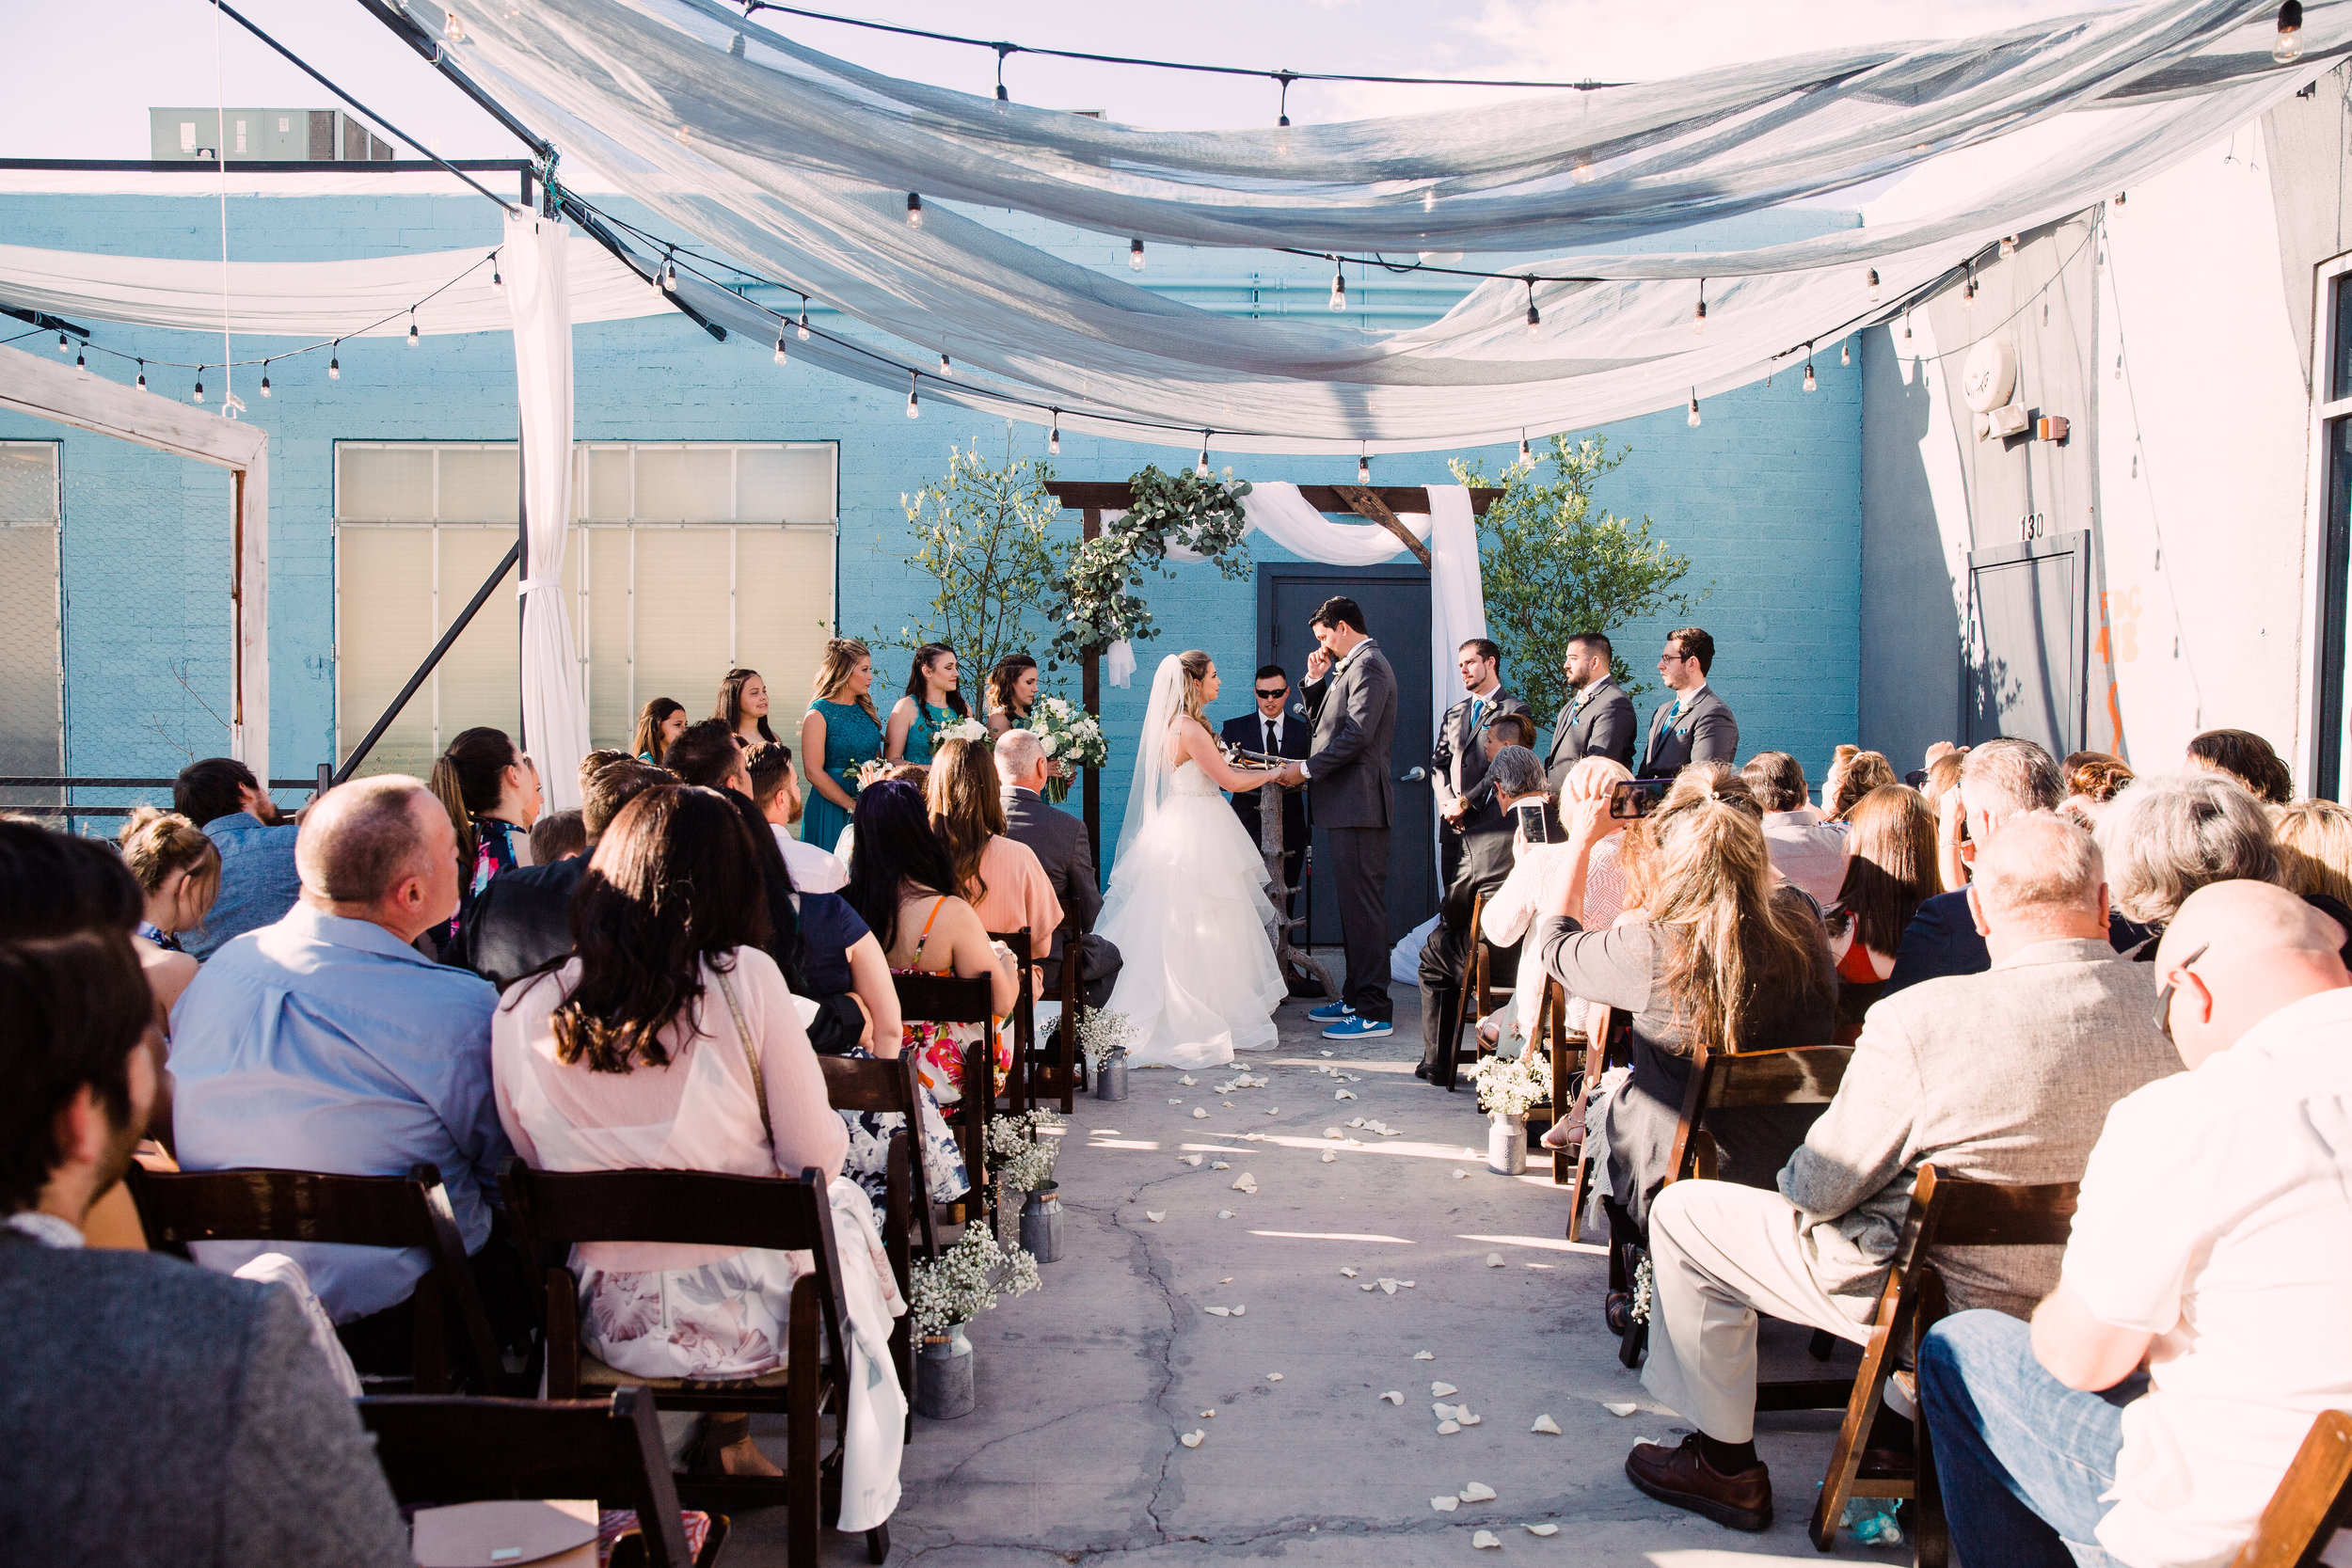 Their gorgeous ceremony